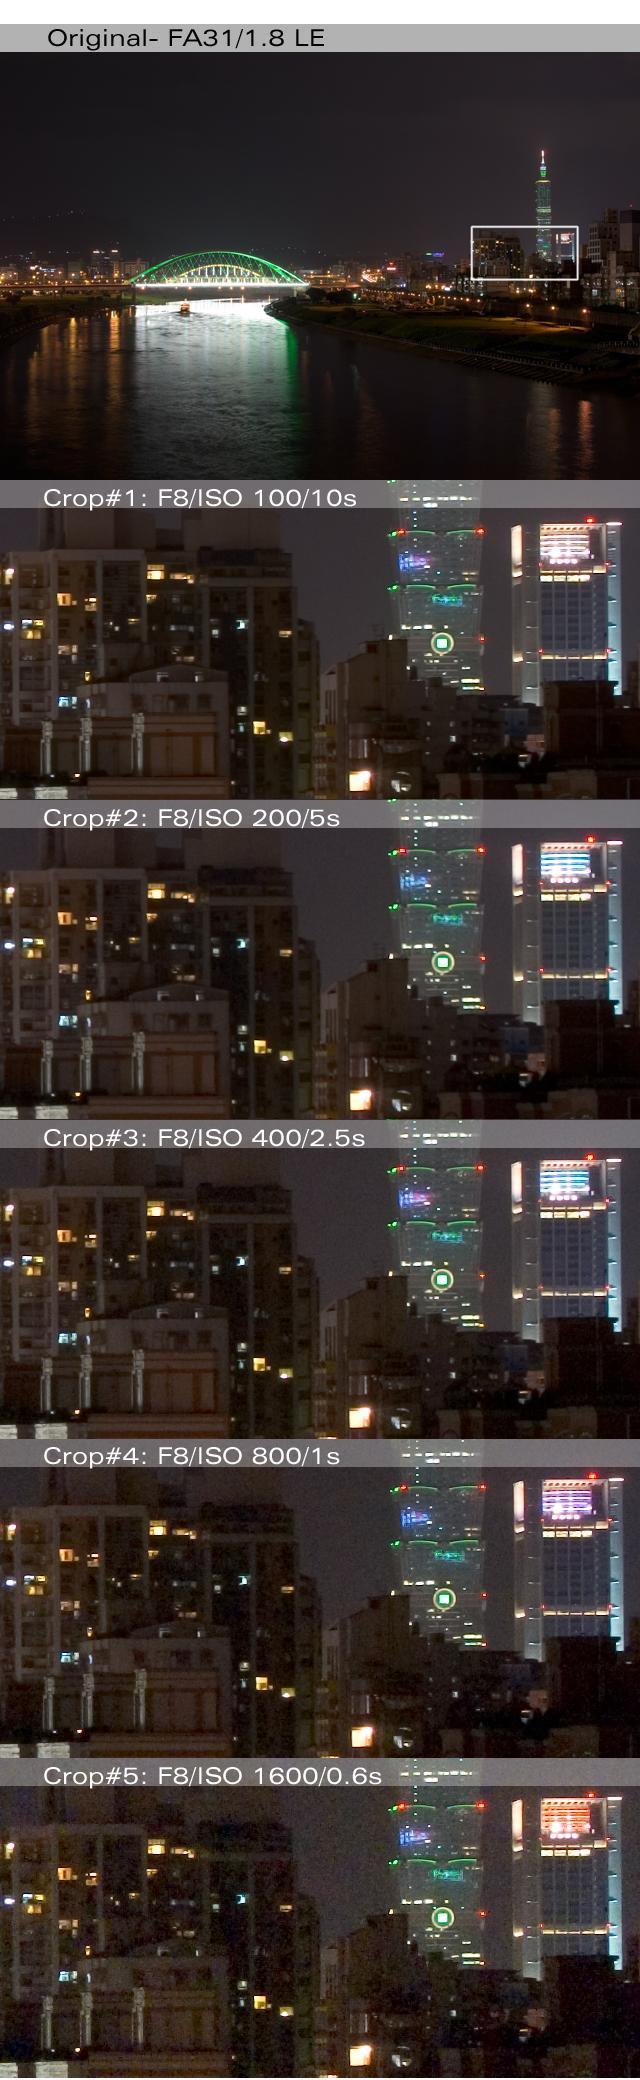 [測試] K10D 夜景ISO測試 w/FA 31/43/77